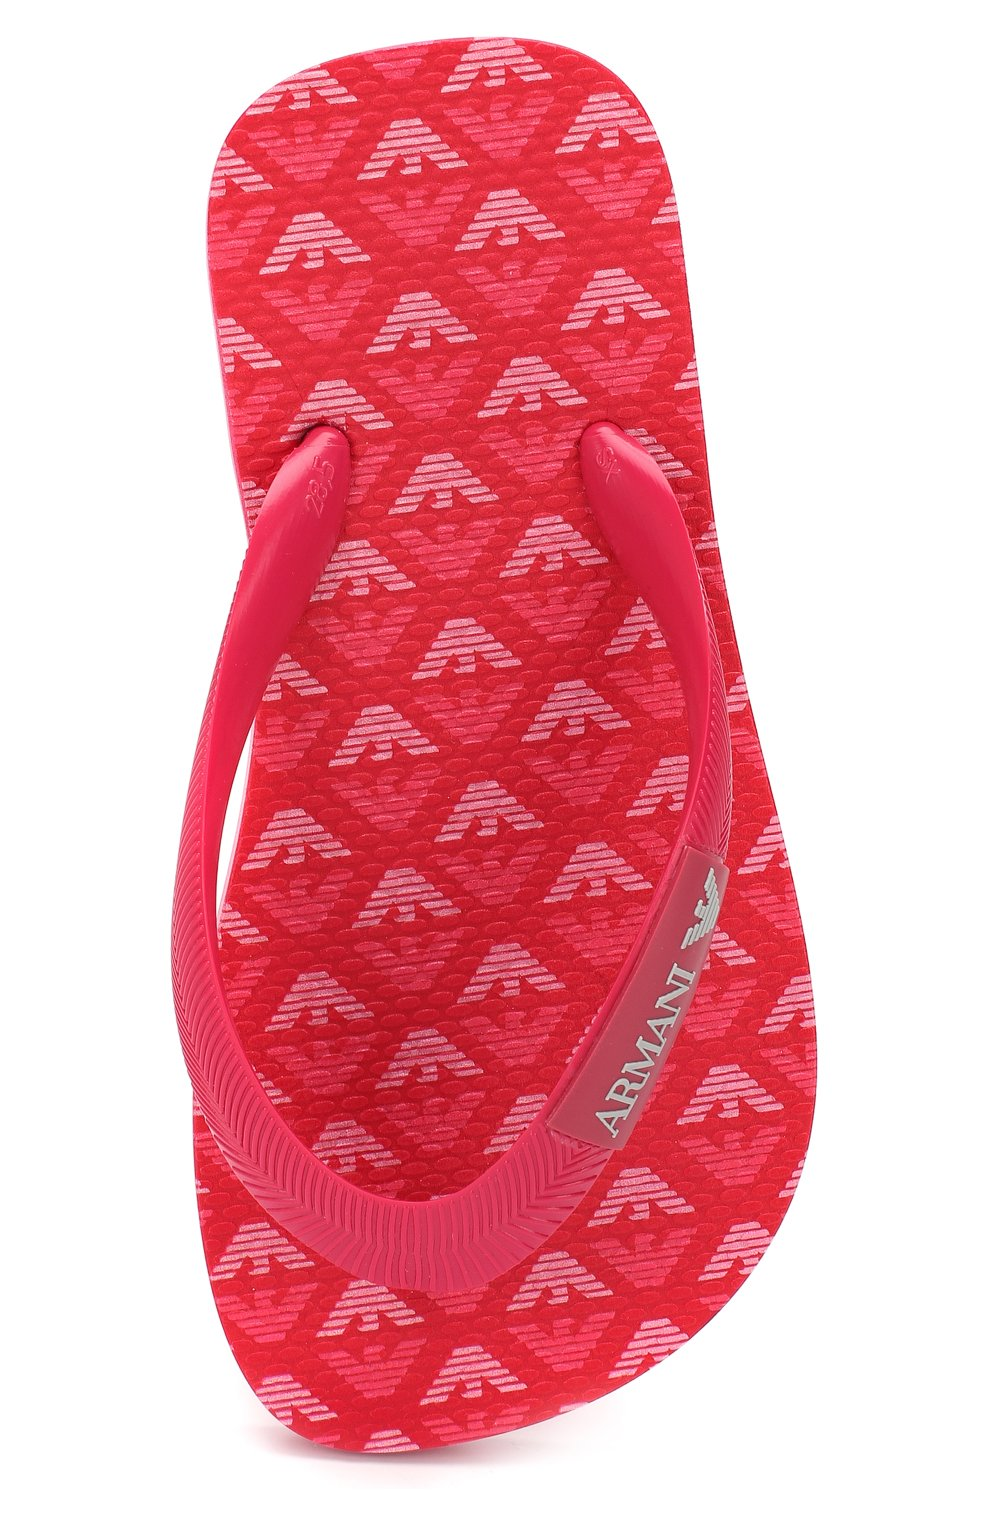 Детские шлепанцы с логотипом бренда EMPORIO ARMANI фуксия цвета, арт. 405517/CC100   Фото 4